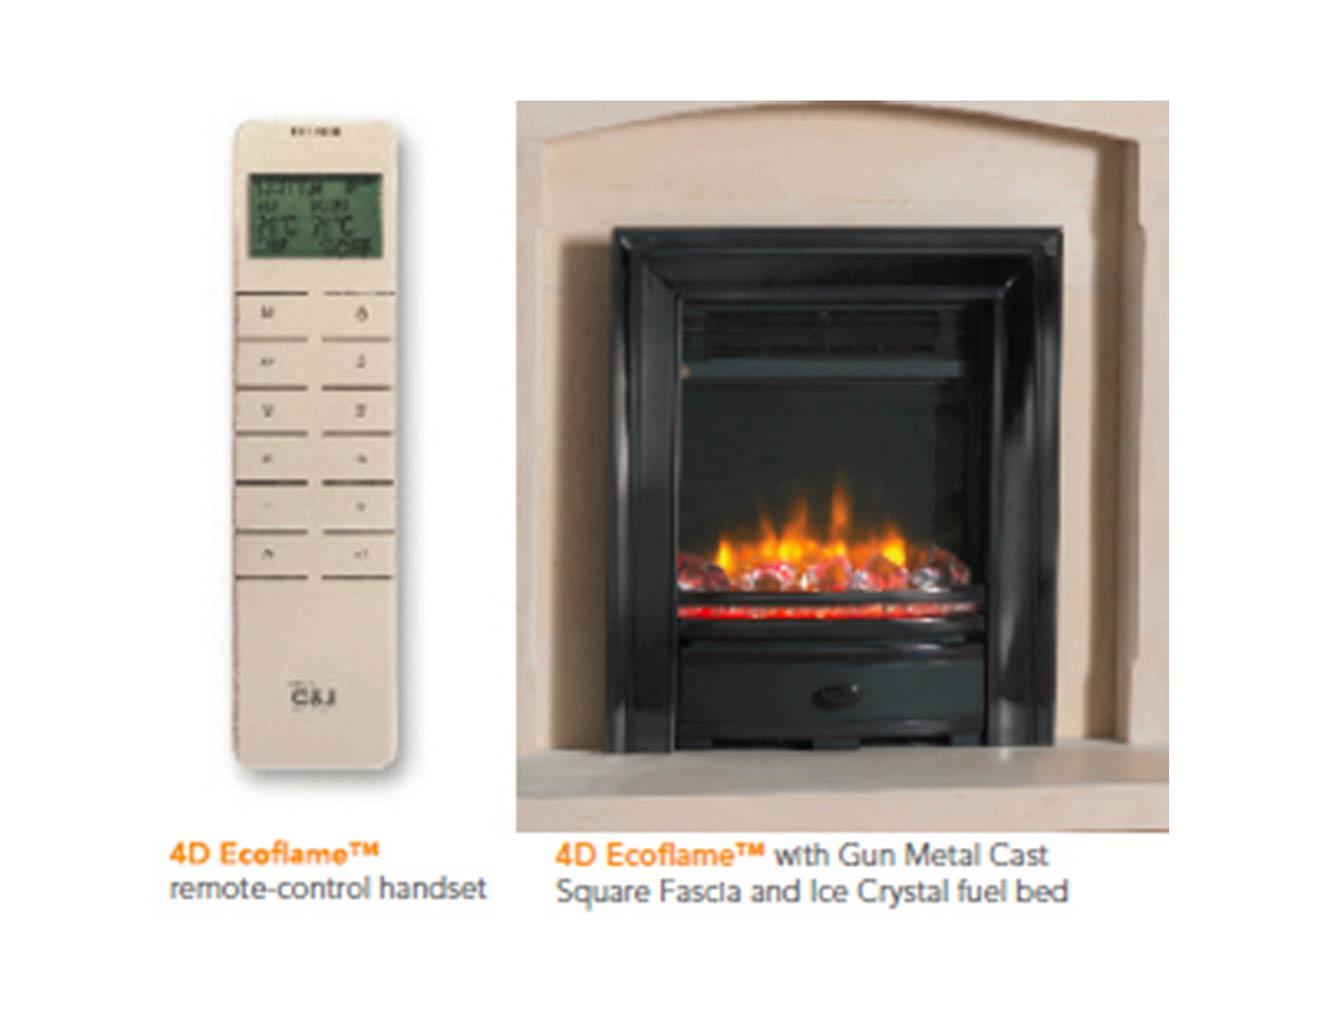 4D Ecoflame Electric Fire  Heat Design